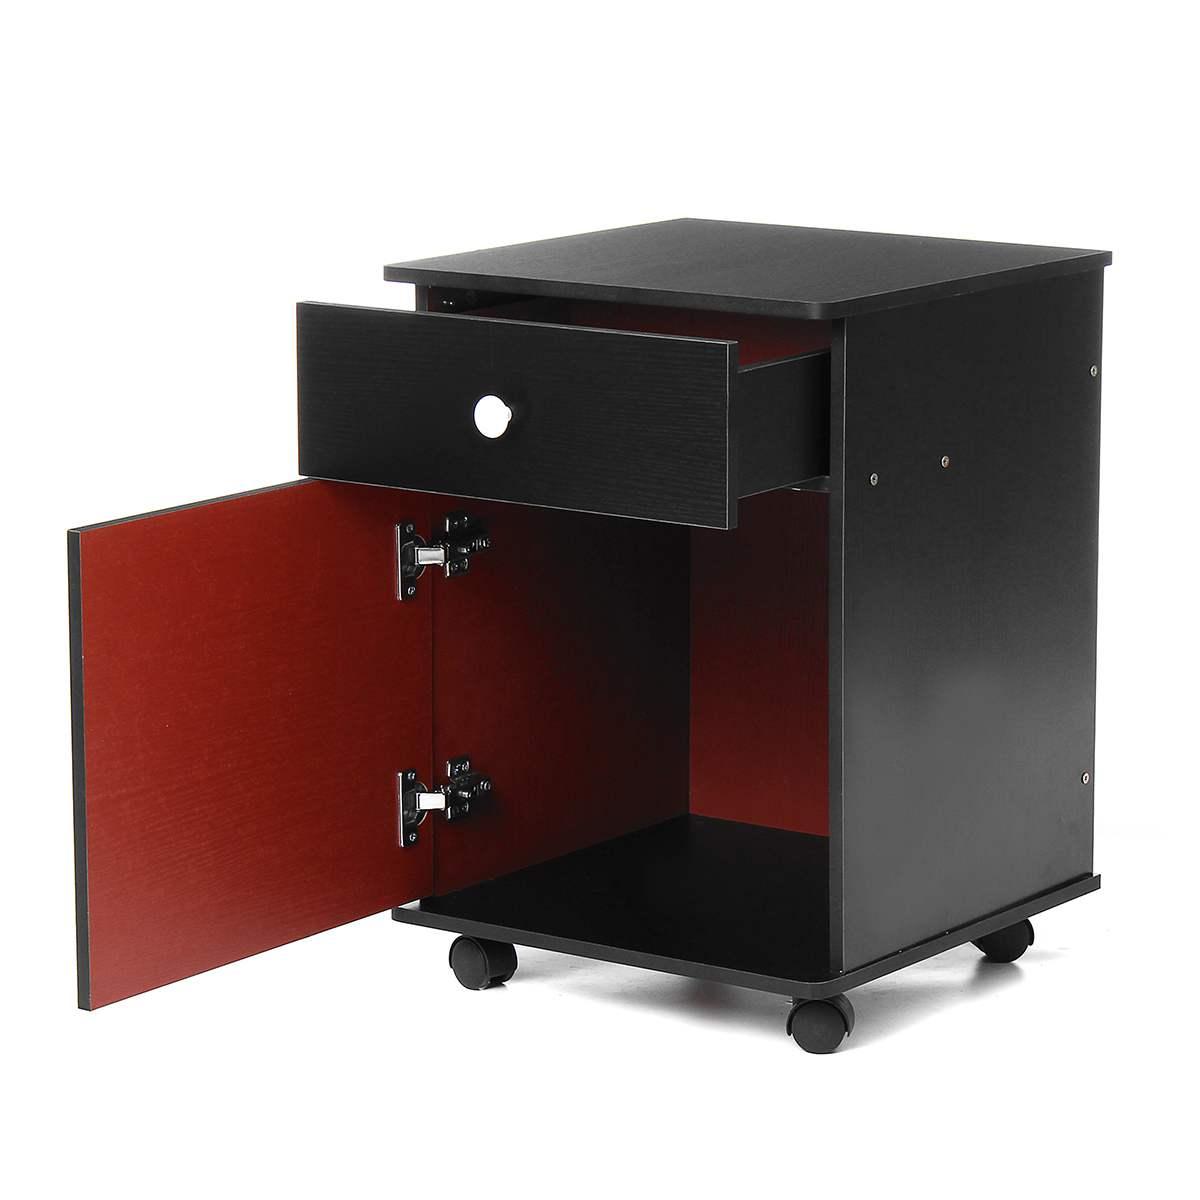 Mobile Nightstand Wooden Bedside Table With Wheels Drawer Organizer Storage Cabinet Desk Bedroom Furniture Office Filing Cabinet